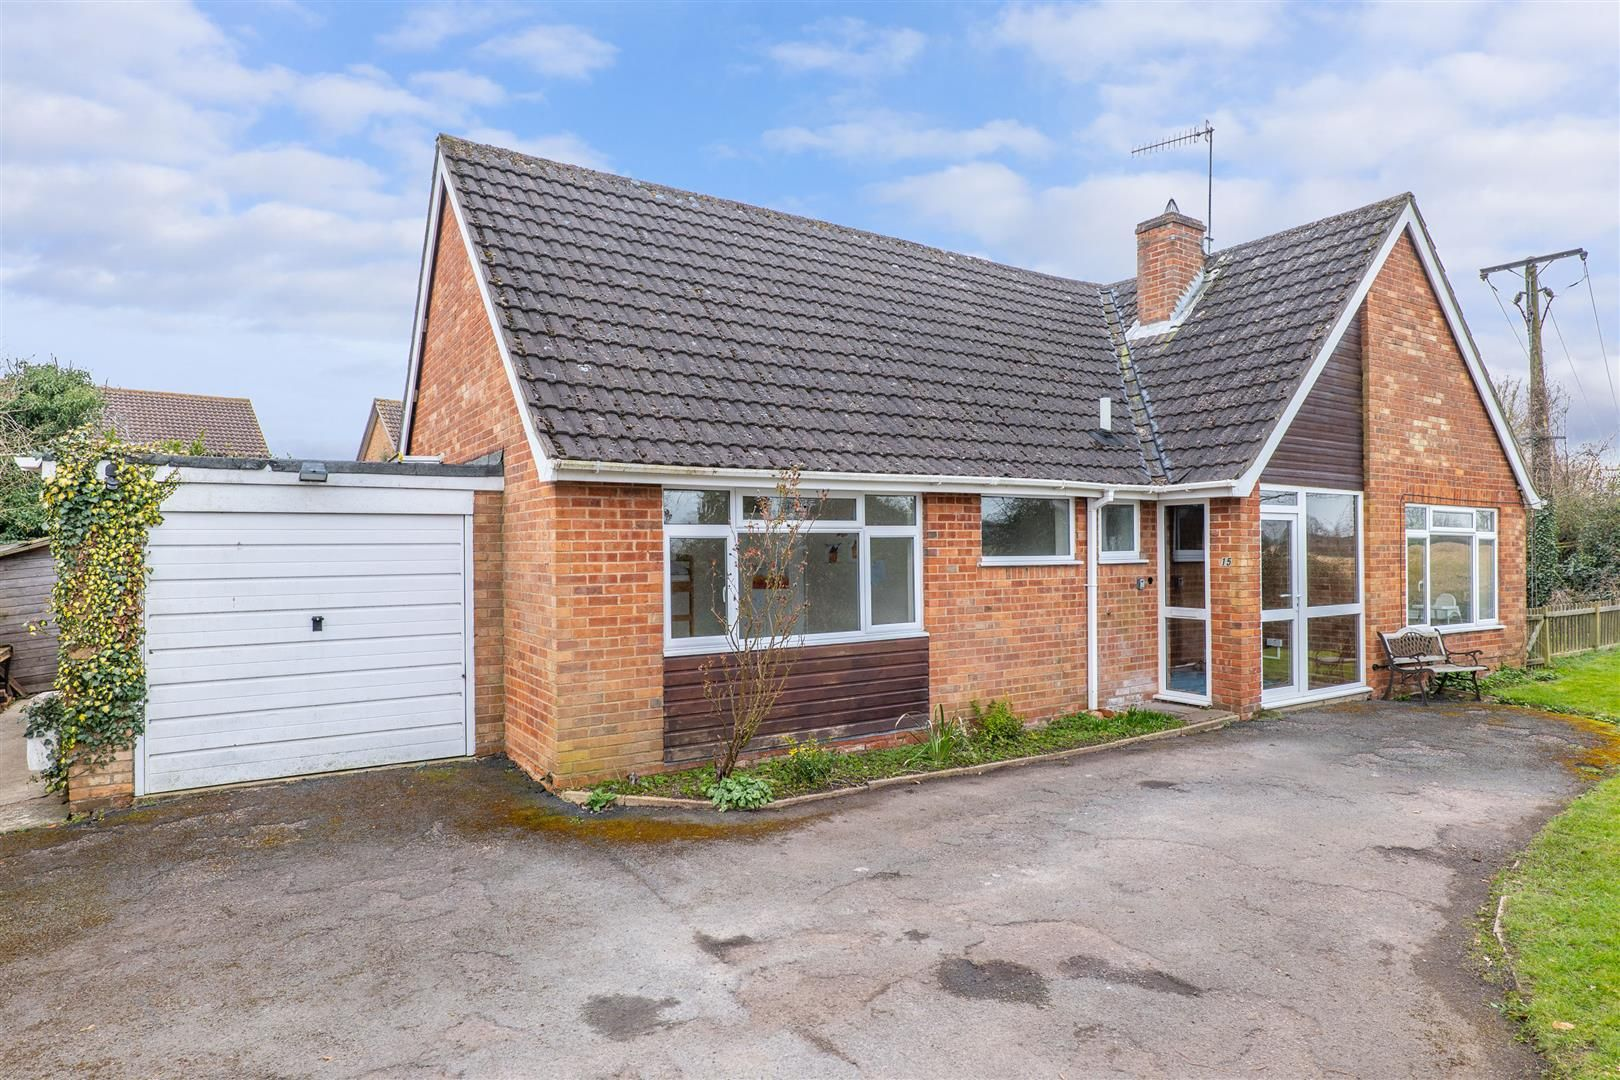 Property photo 1 of 22. P1129626.Jpg